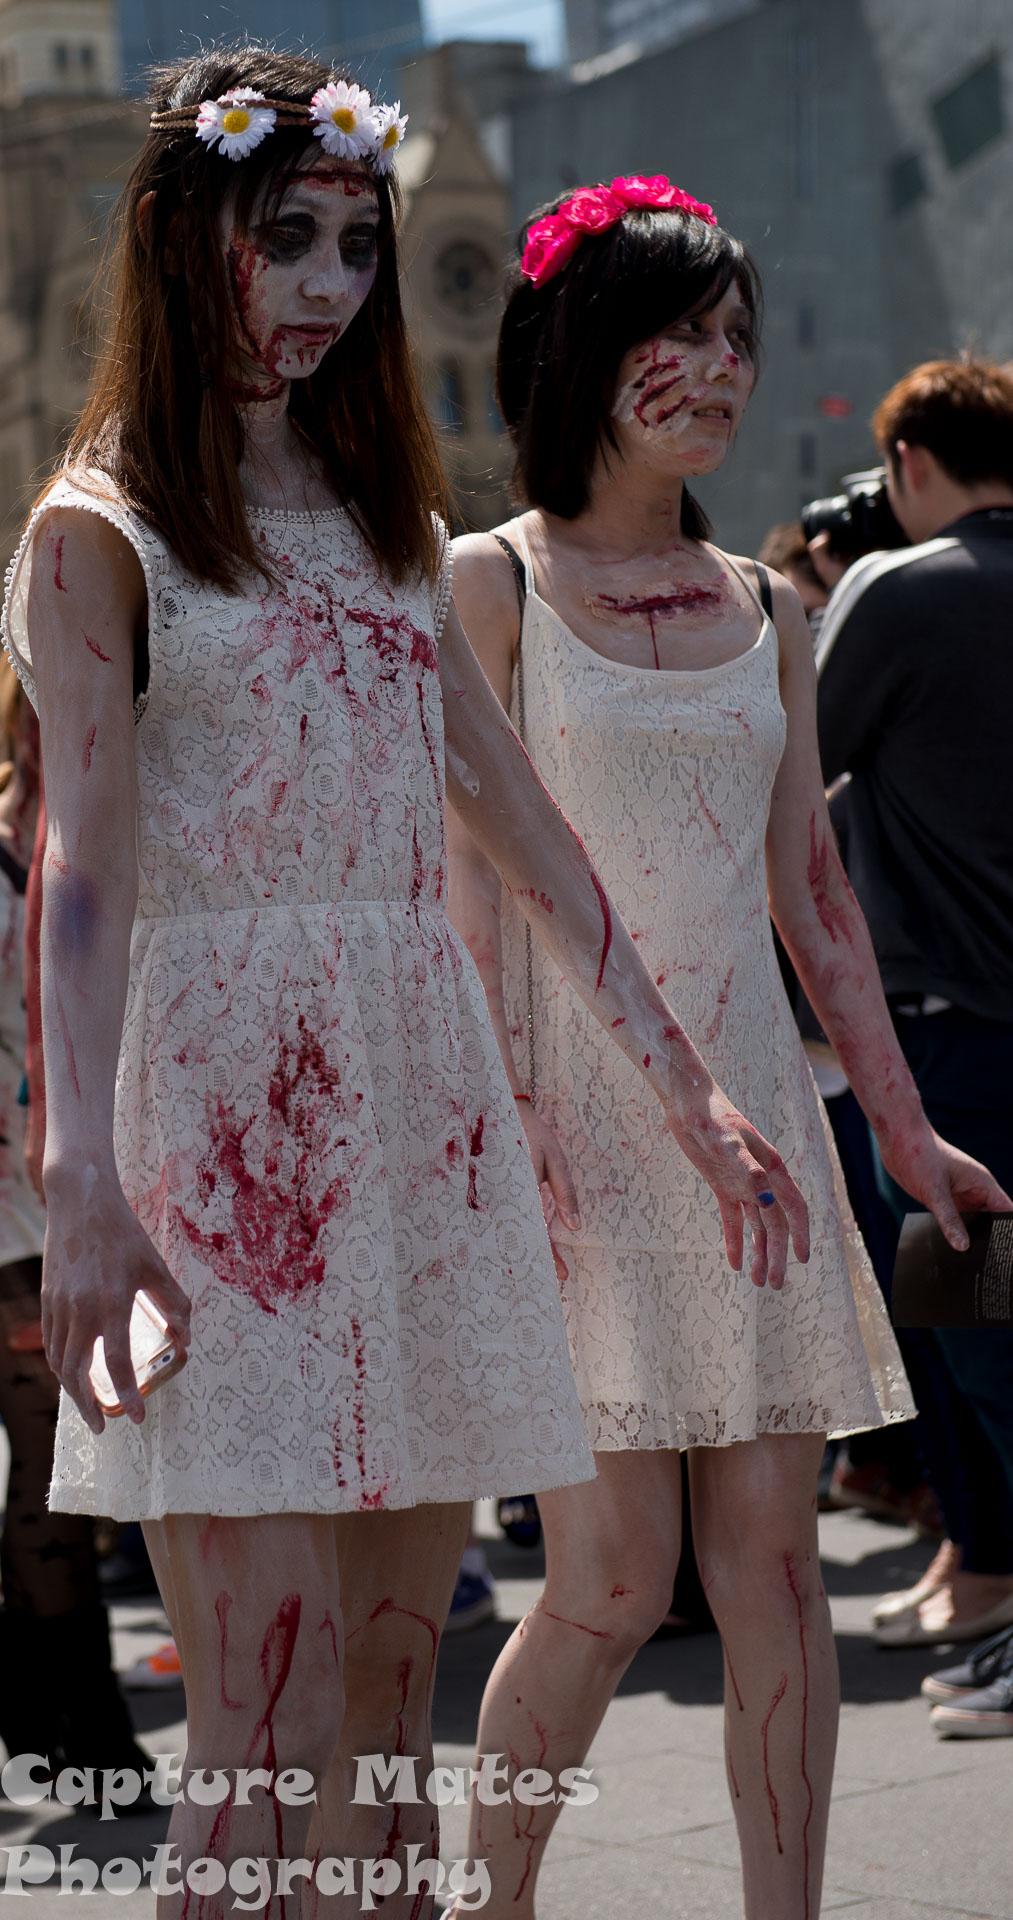 Zombie-268.jpg